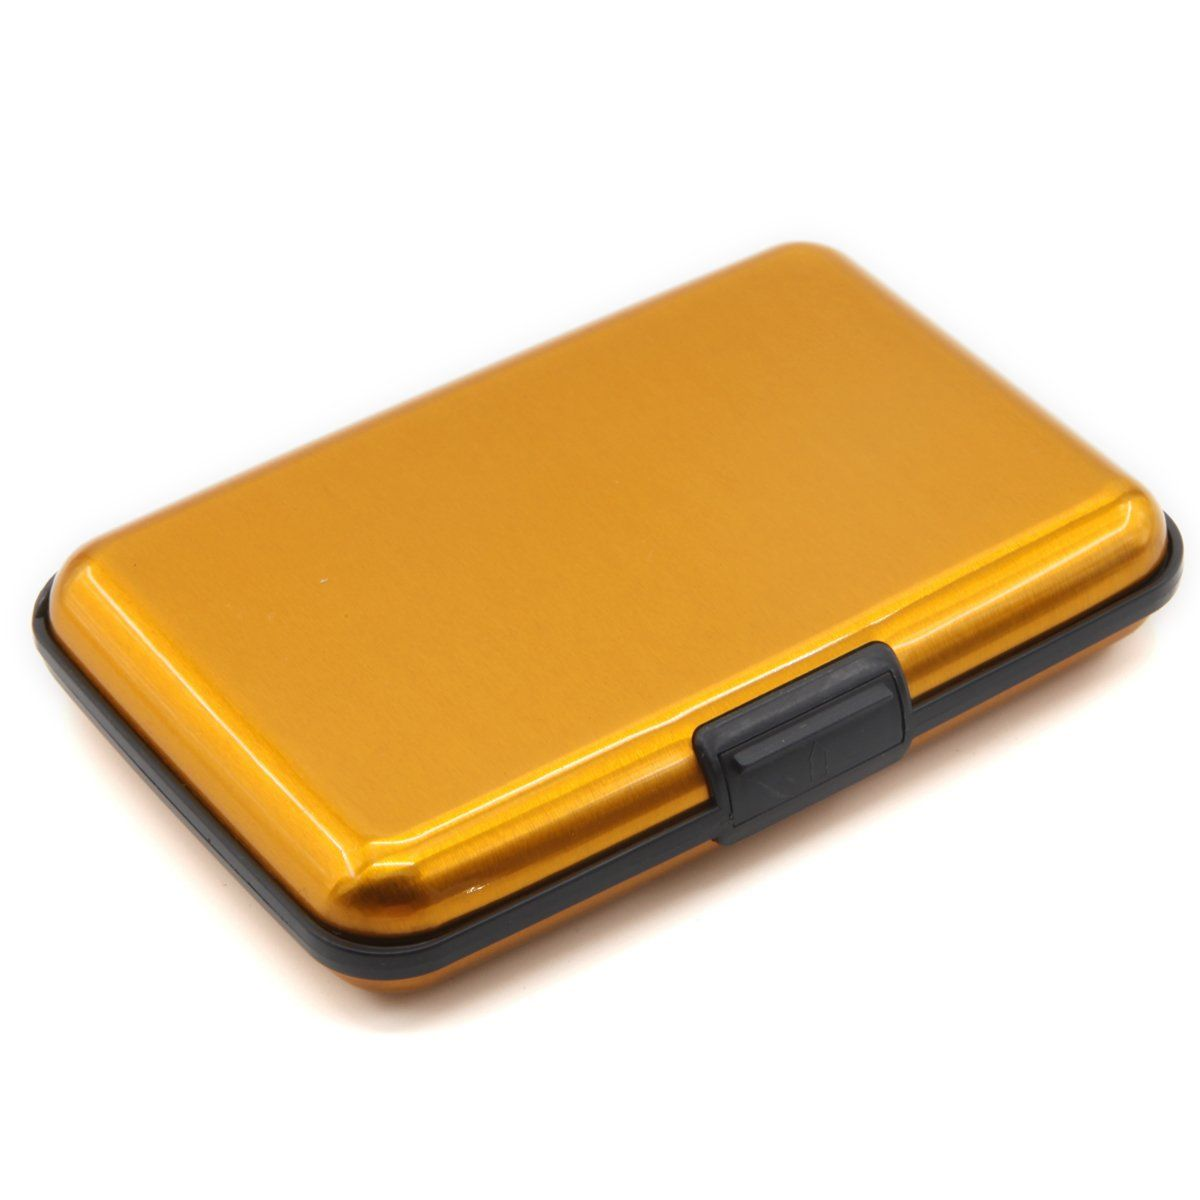 Deezone latest aluminum rfid blocking credit card holder